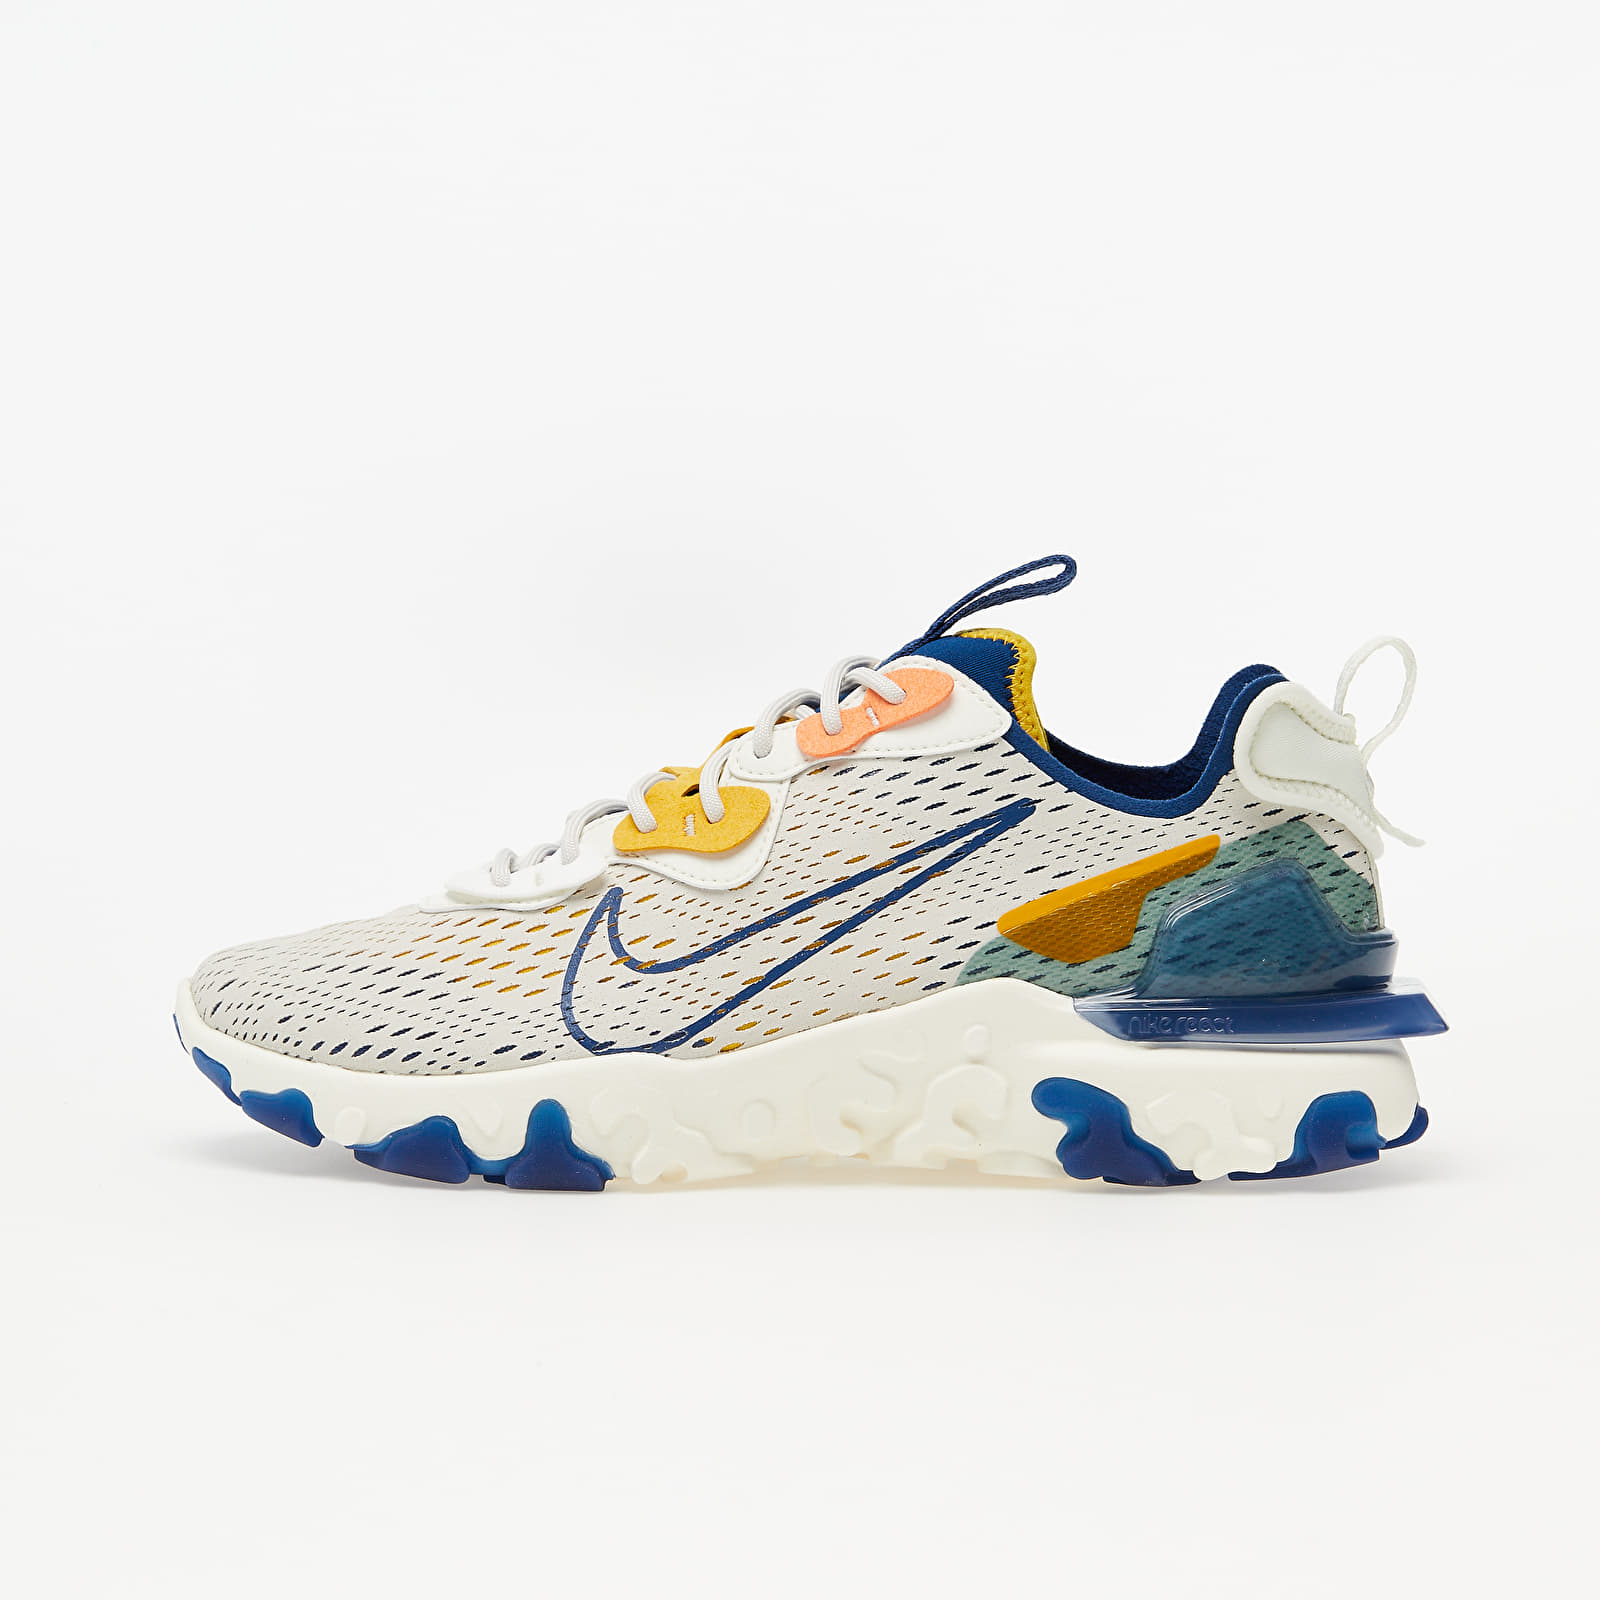 Scarpe e sneaker da uomo Nike React Vision Lt Orewood Brn/ Coastal Blue-Sail